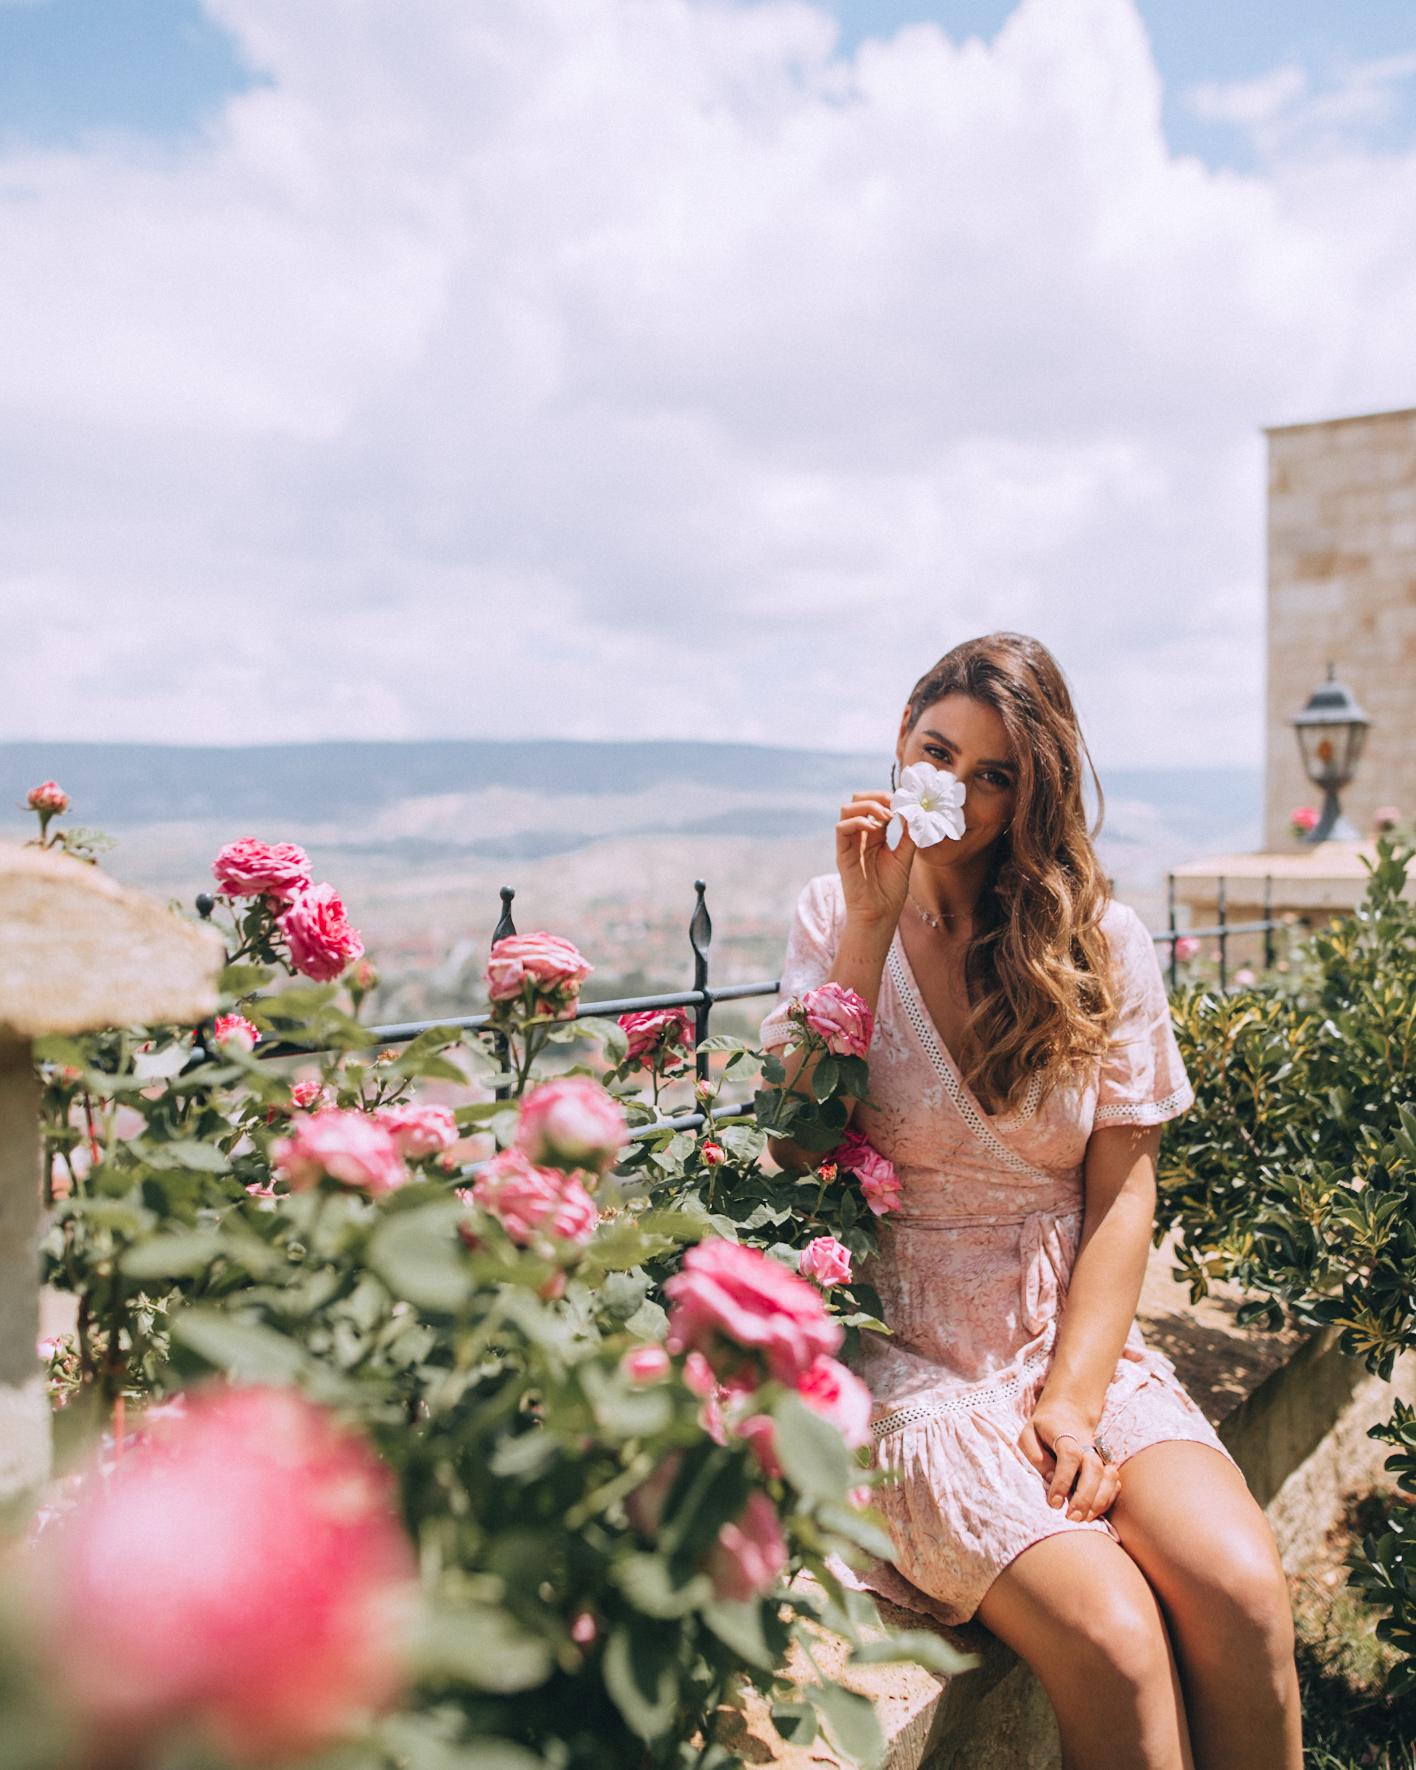 A woman smelling the roses at Kaykapi Premium Cave hotel in Cappadocia